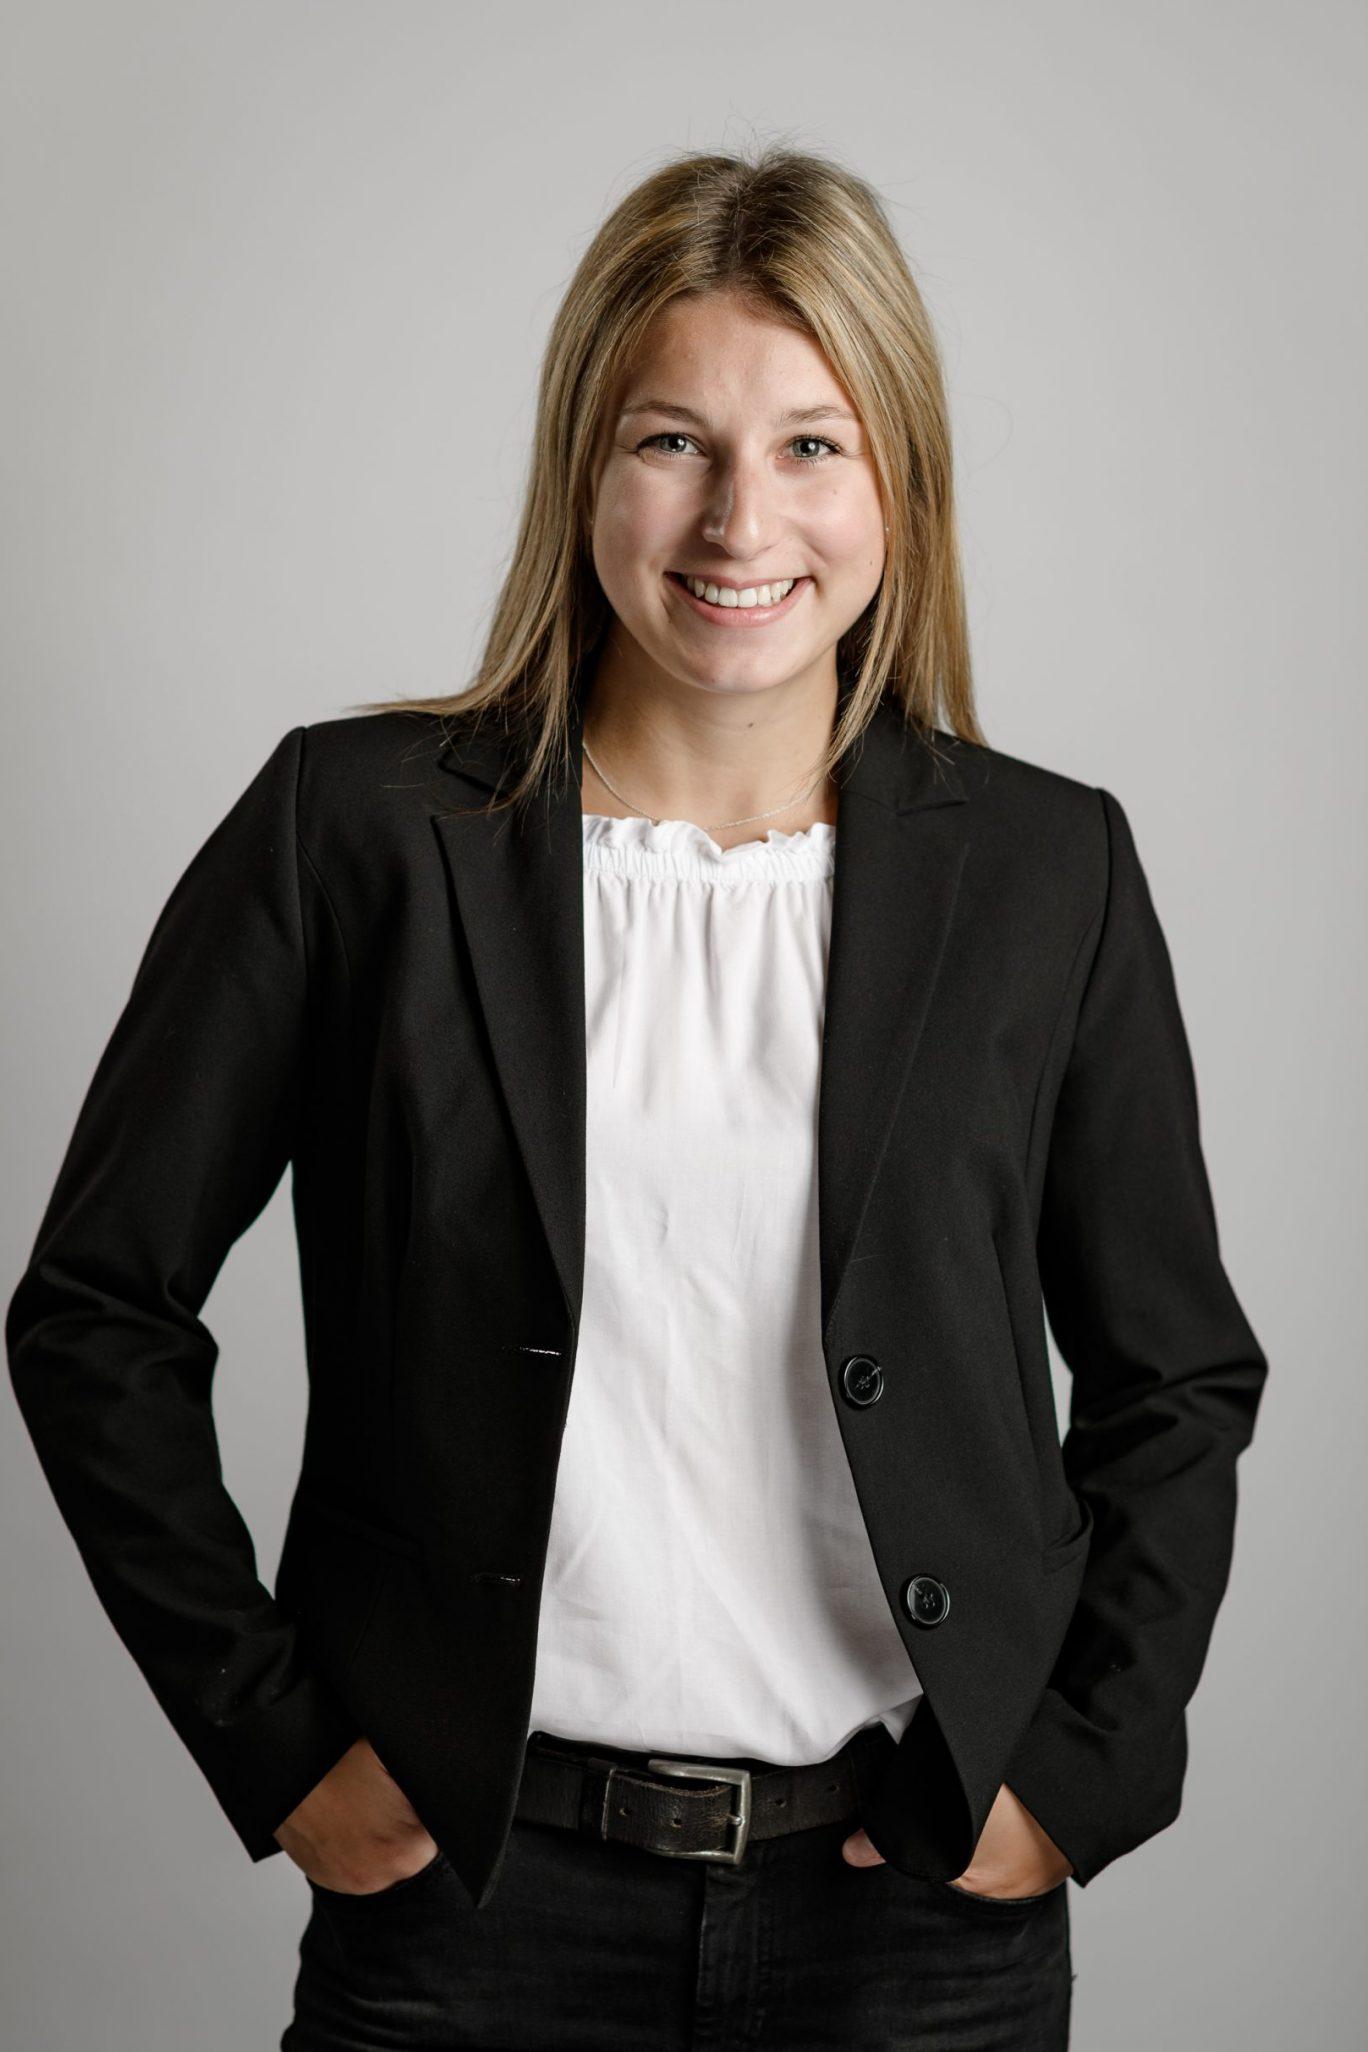 Laura Barnsteiner